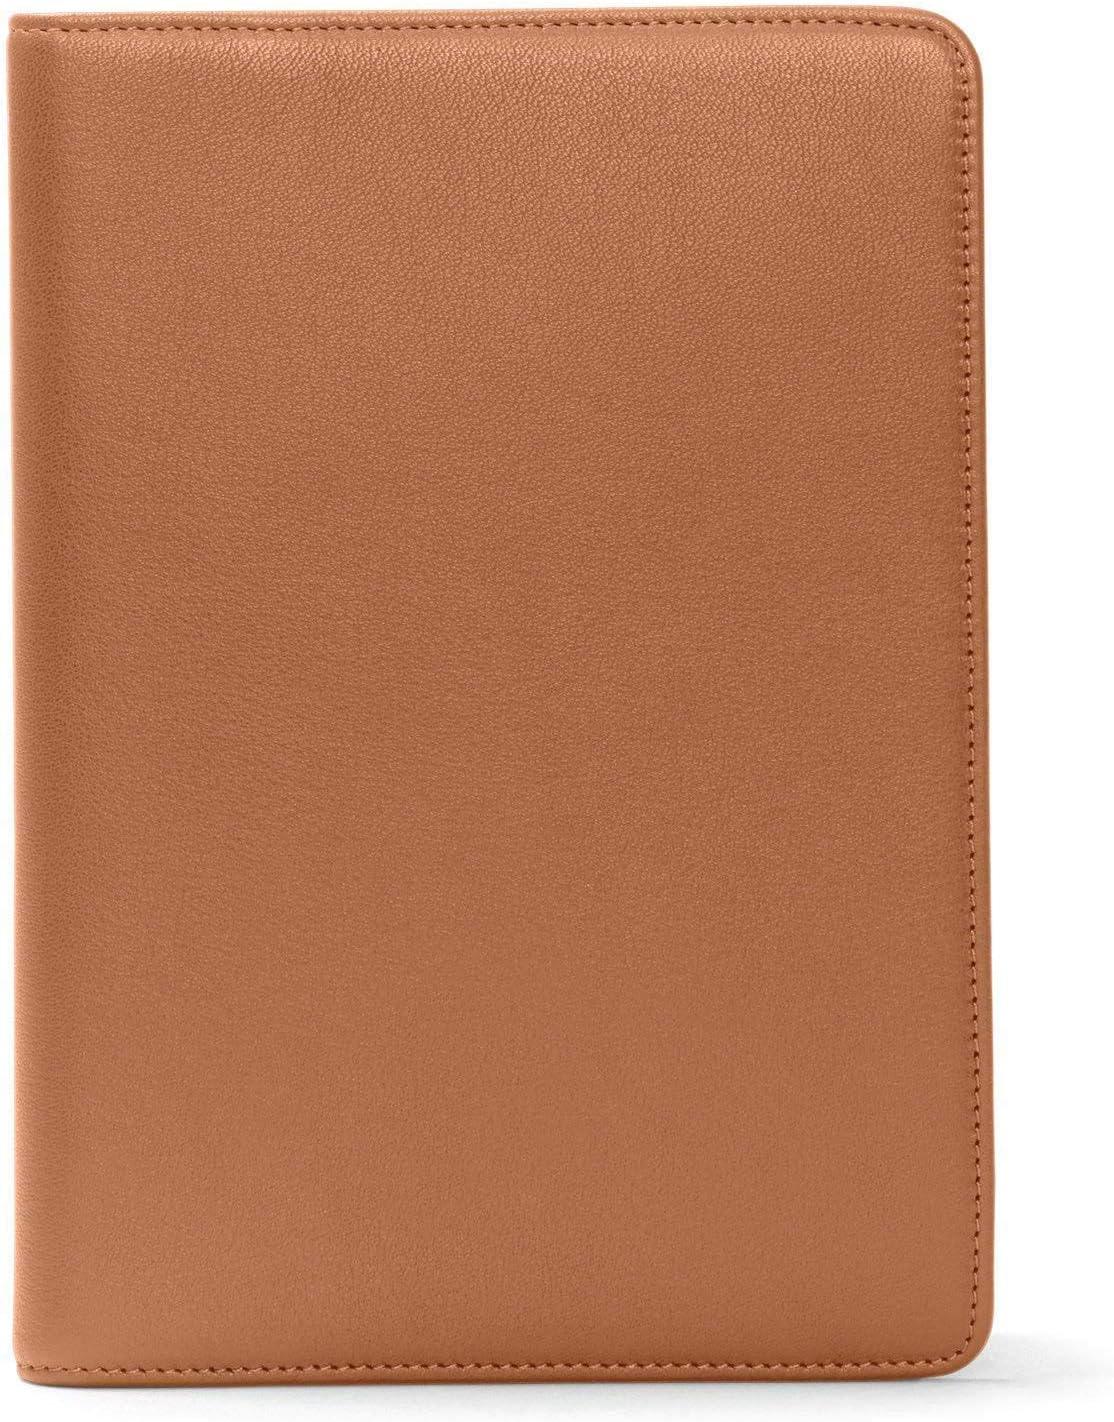 Leatherology Cognac Directly managed store Spiral Journal Award-winning store Medium